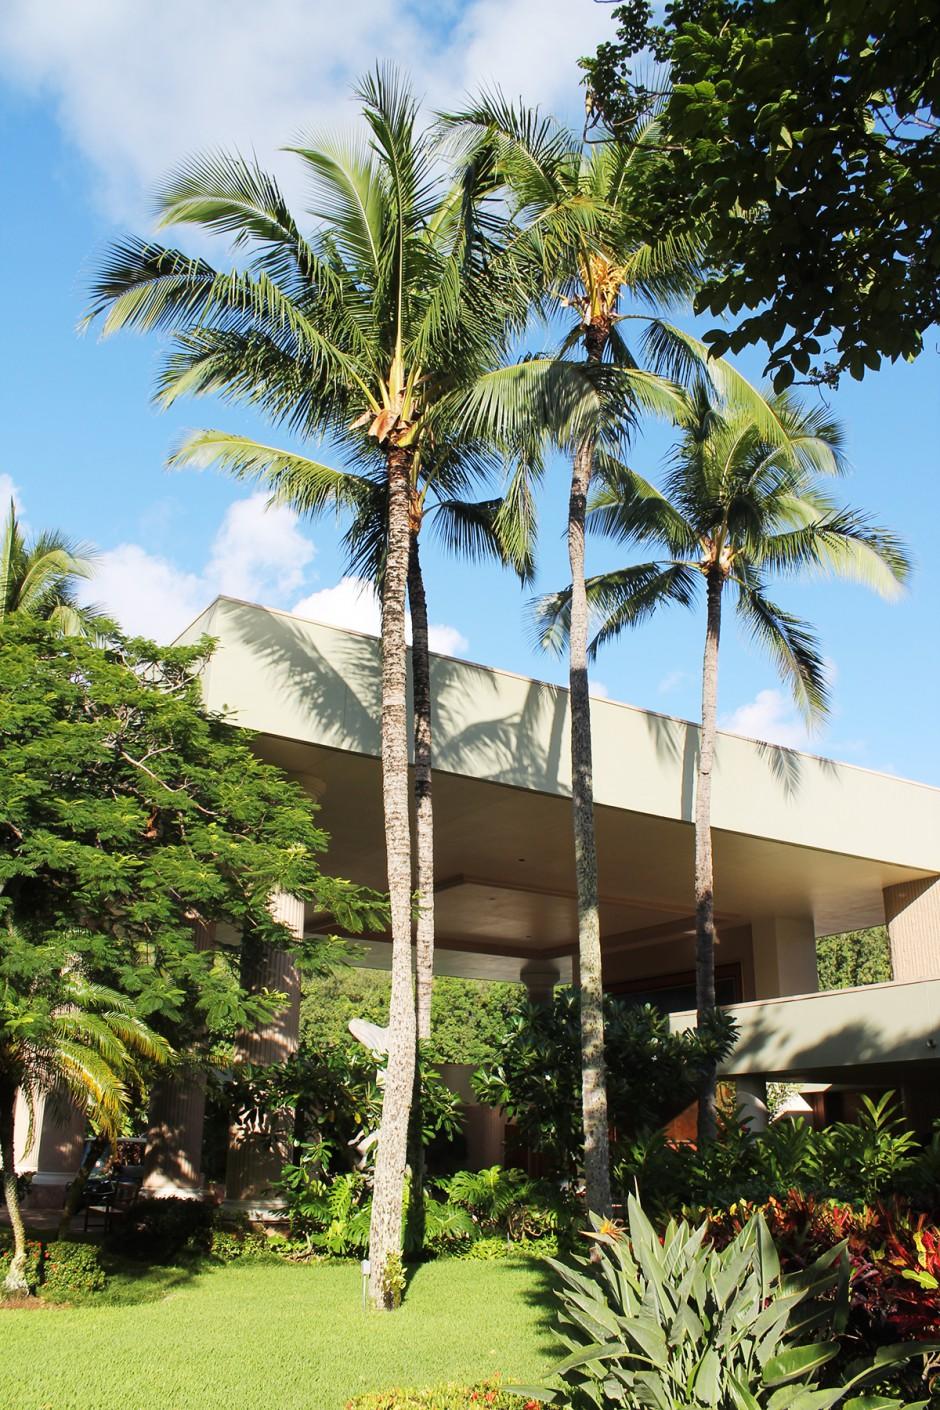 www.wildandfit.net-hawaii-kauai-lihue-marriott-hotel-13